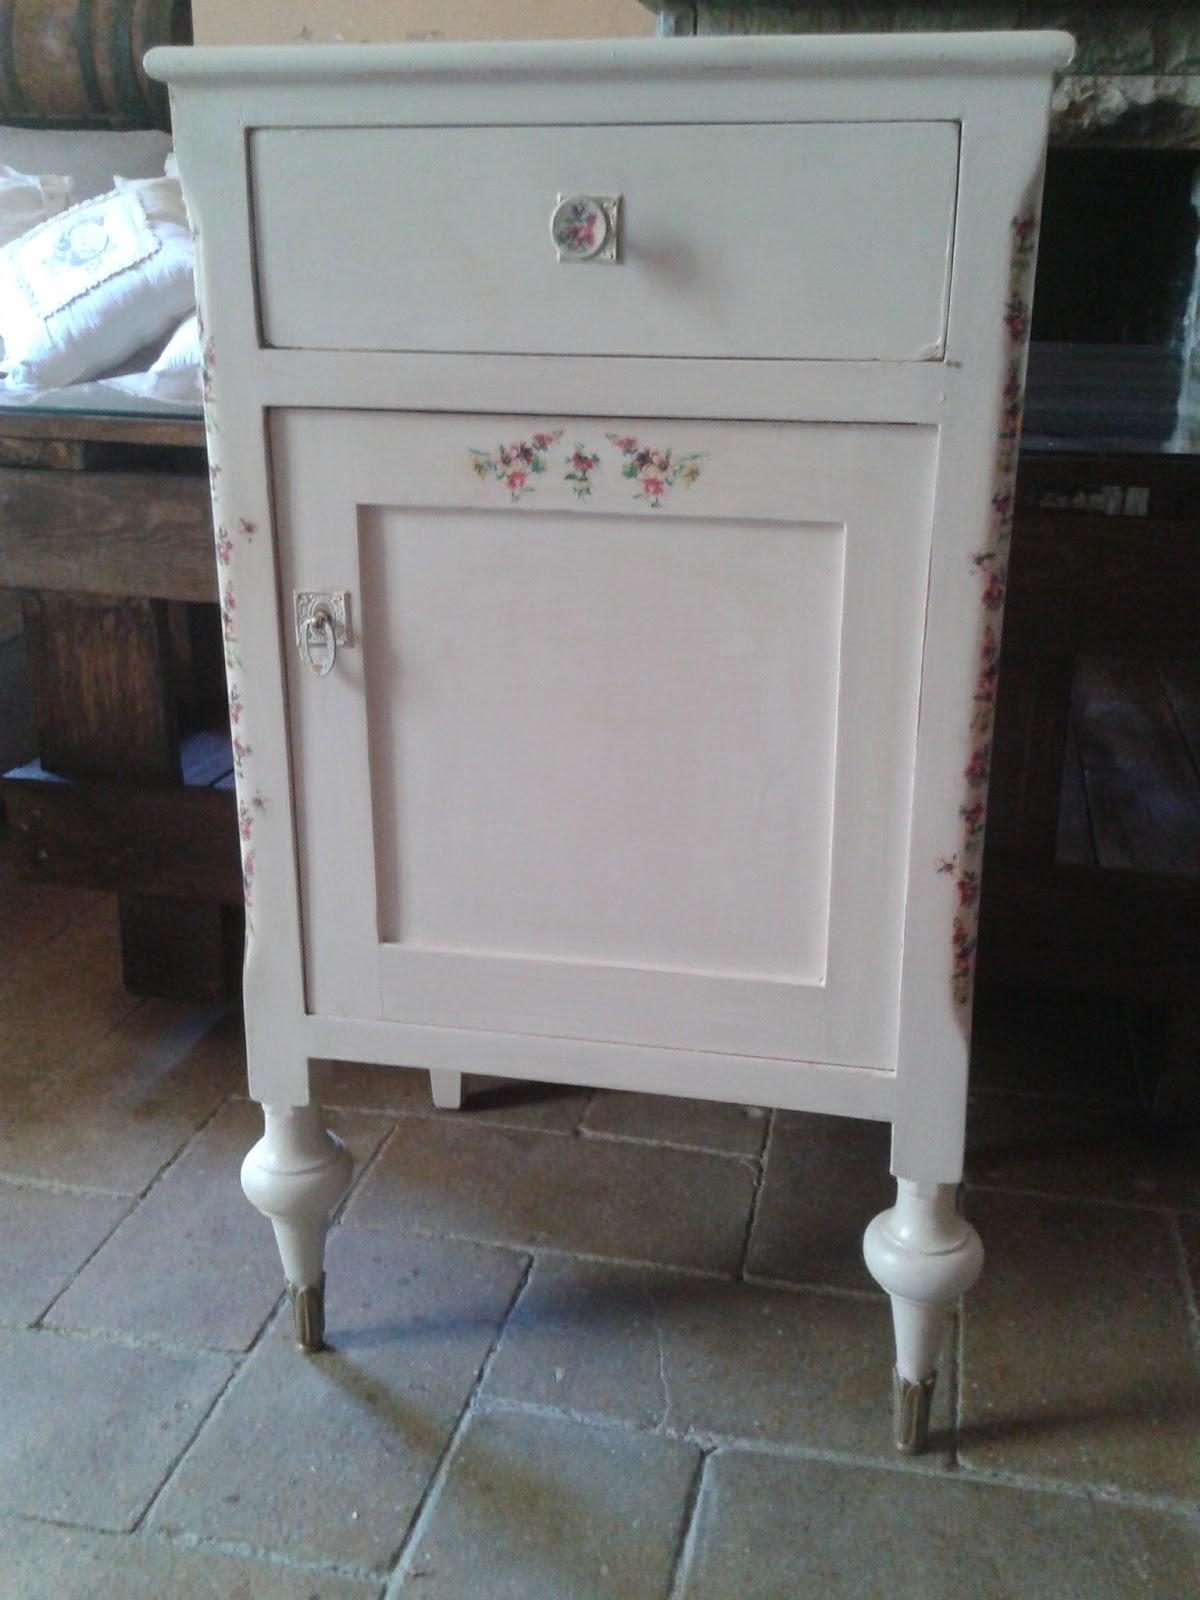 Decoupage transfer y otras t cnicas restauraci n de - Restaurar muebles con carcoma ...